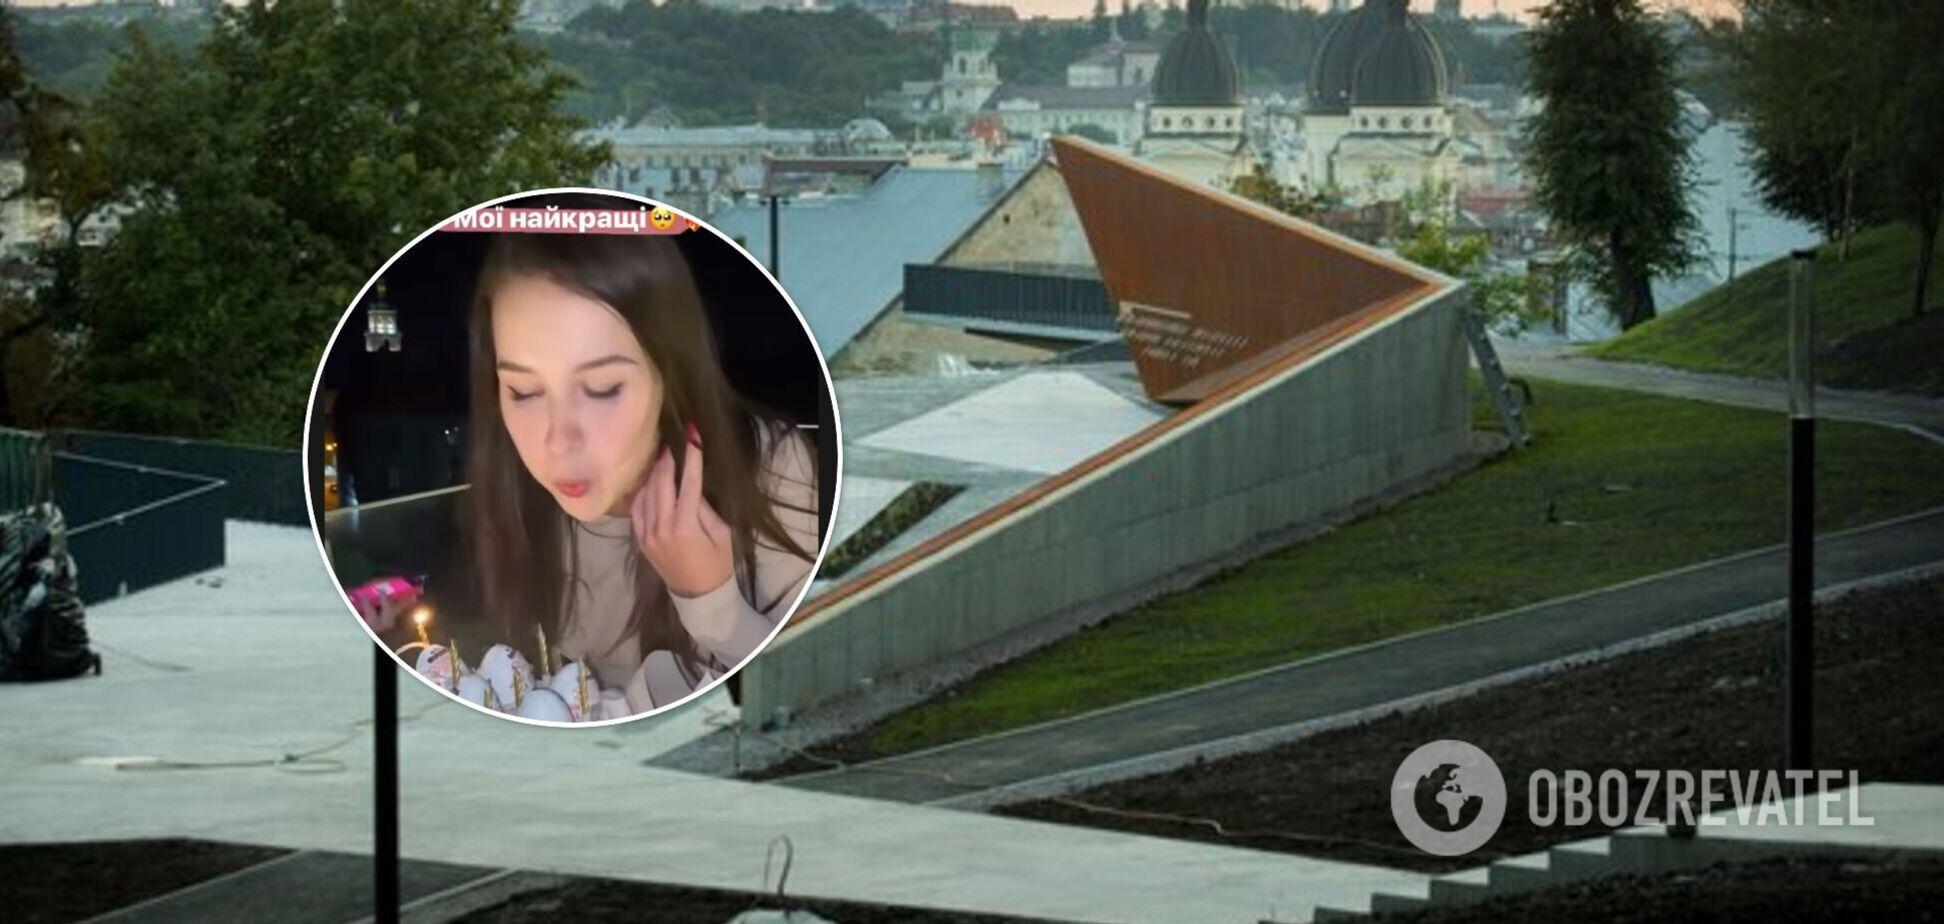 Во Львове девушки устроили вечеринку на мемориале Героев Небесной Сотни. Видео